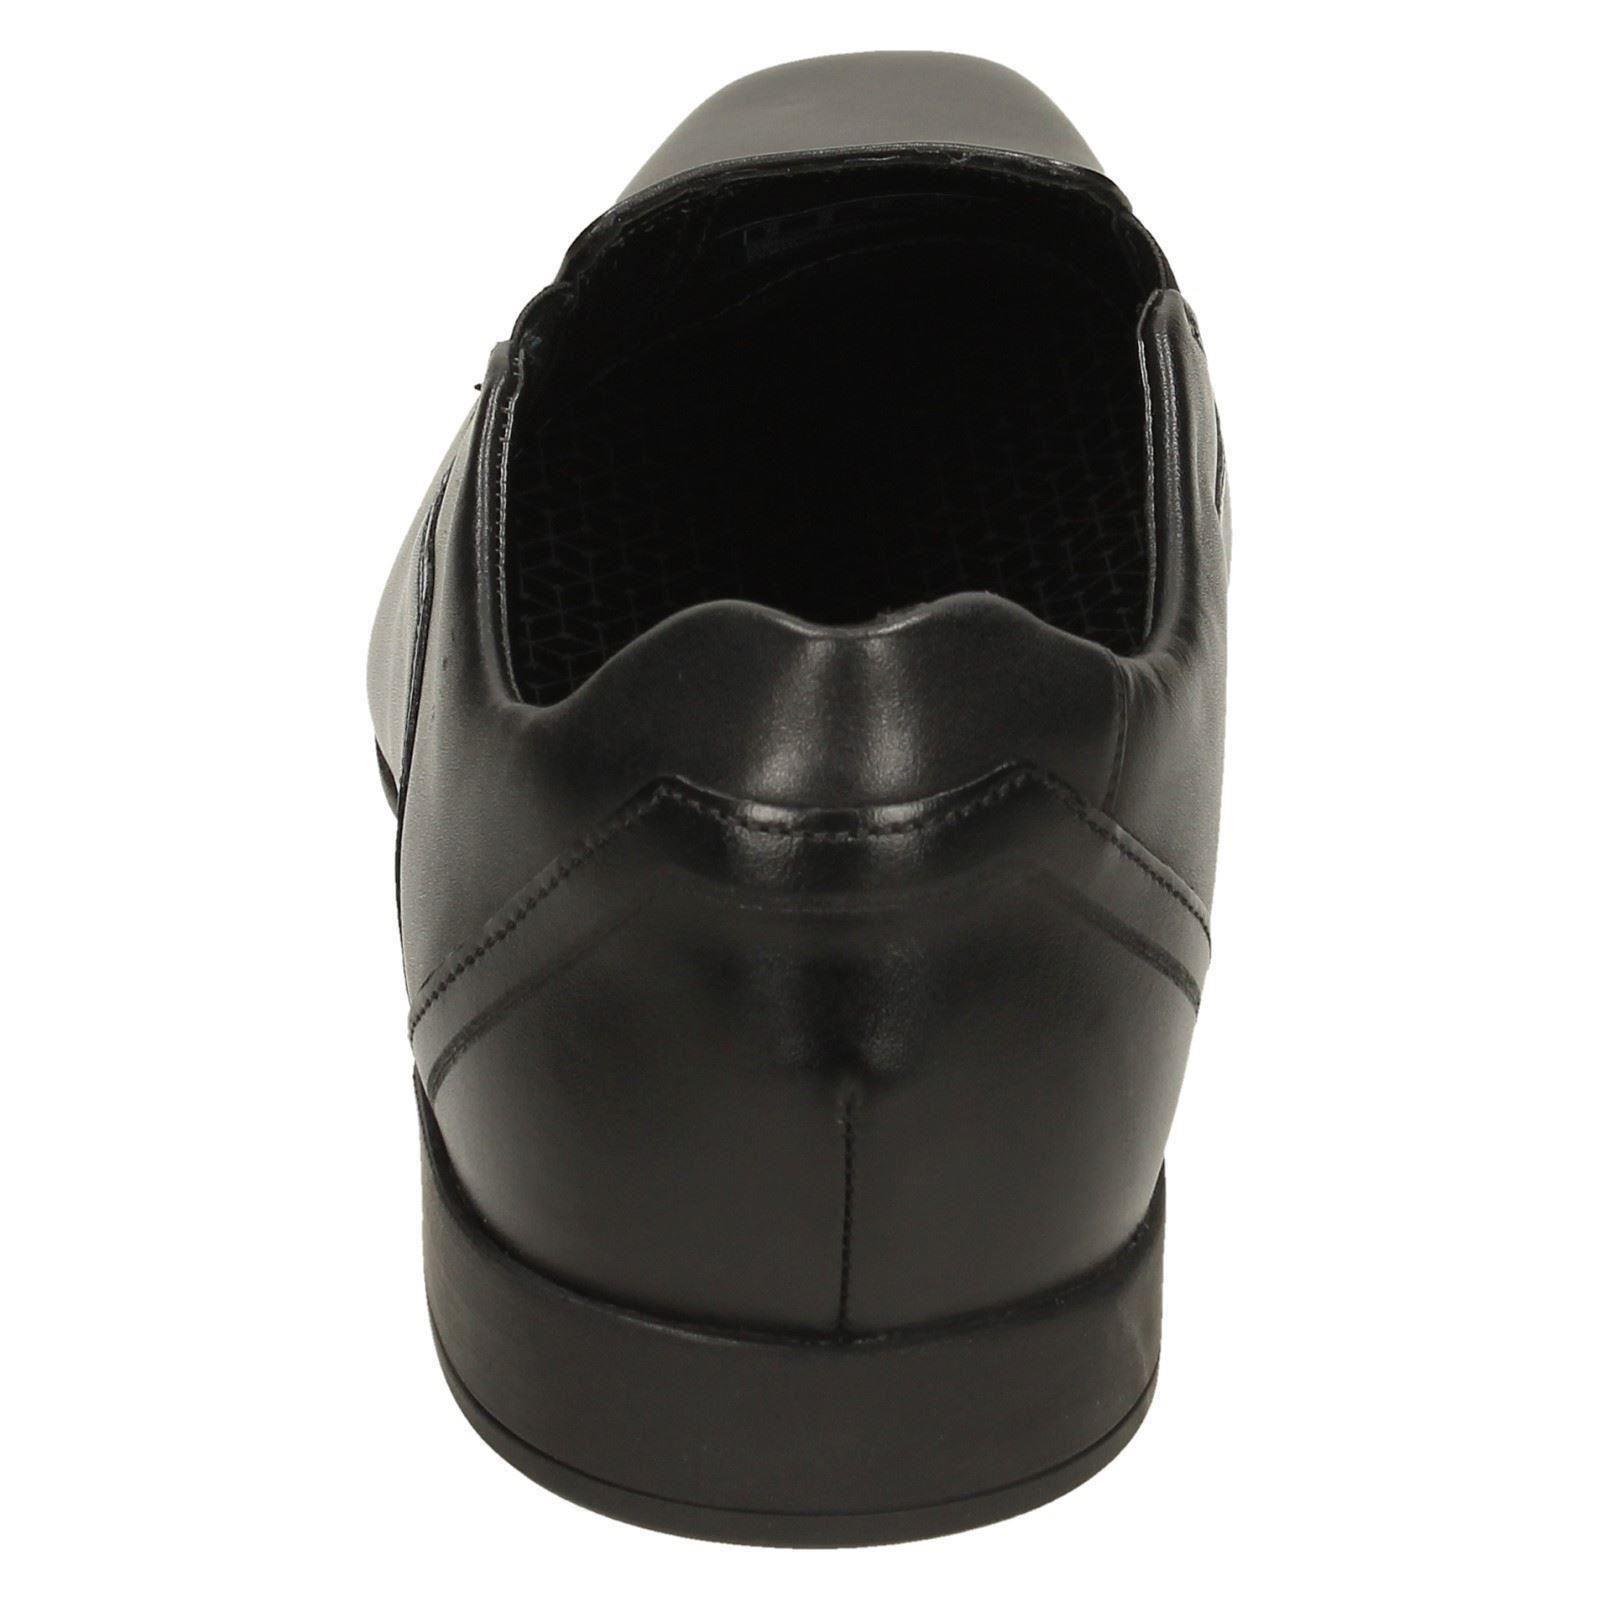 Hombre Clarks Formal Formal Formal Mocasines estilo-règlement Slip 697106